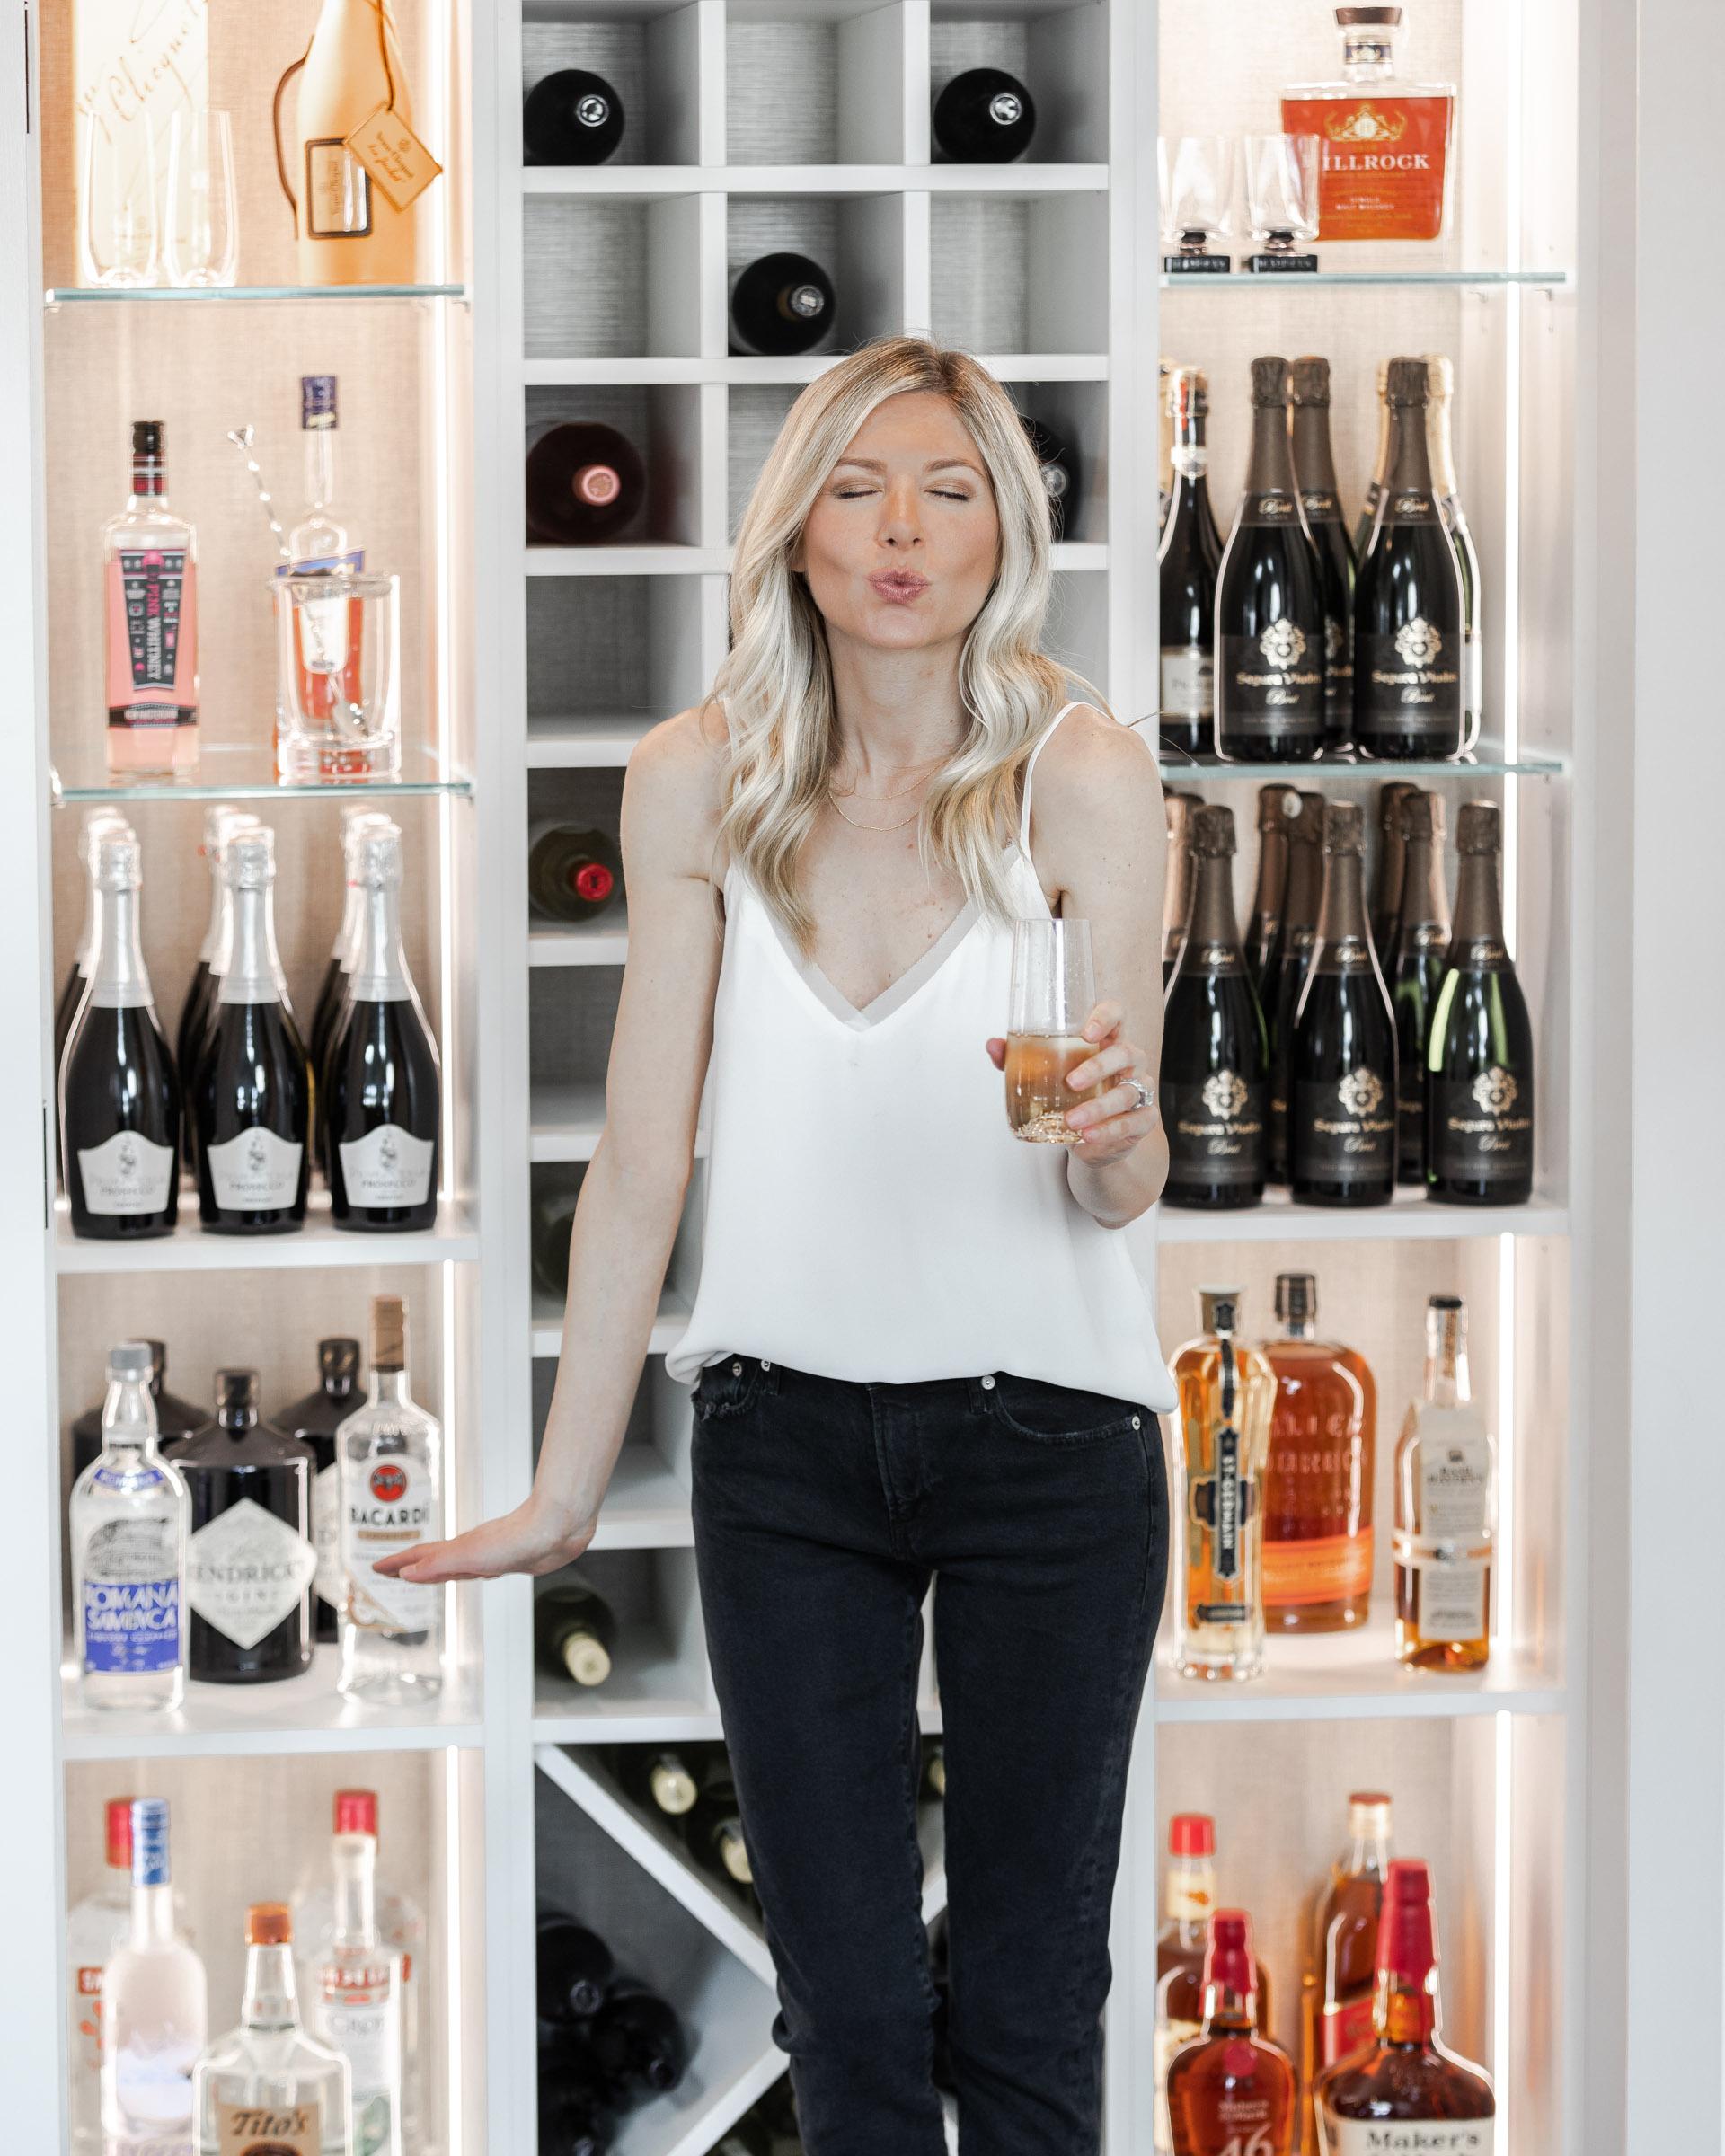 liquor-closet-organization-with-lights-kiss-face-the-glamorous-gal